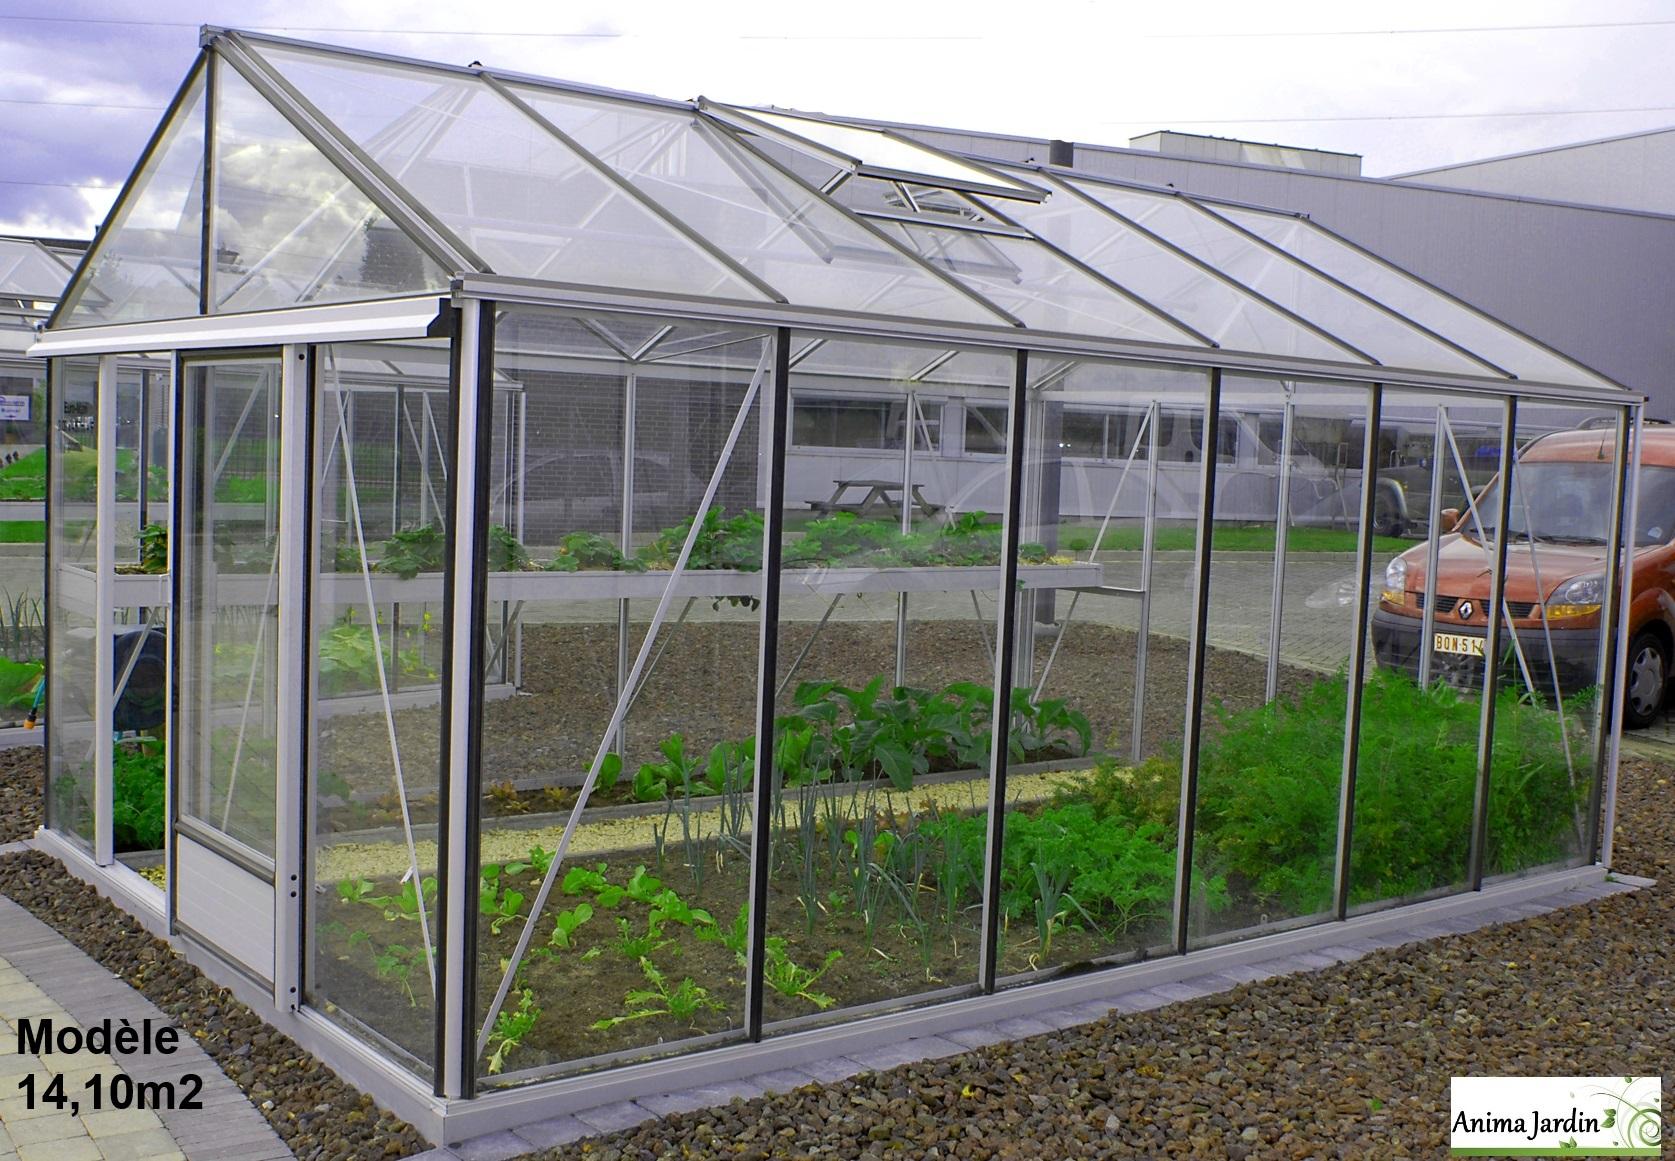 Serre Jardin horticole 14 10 m2 en verre trempé Aluminium